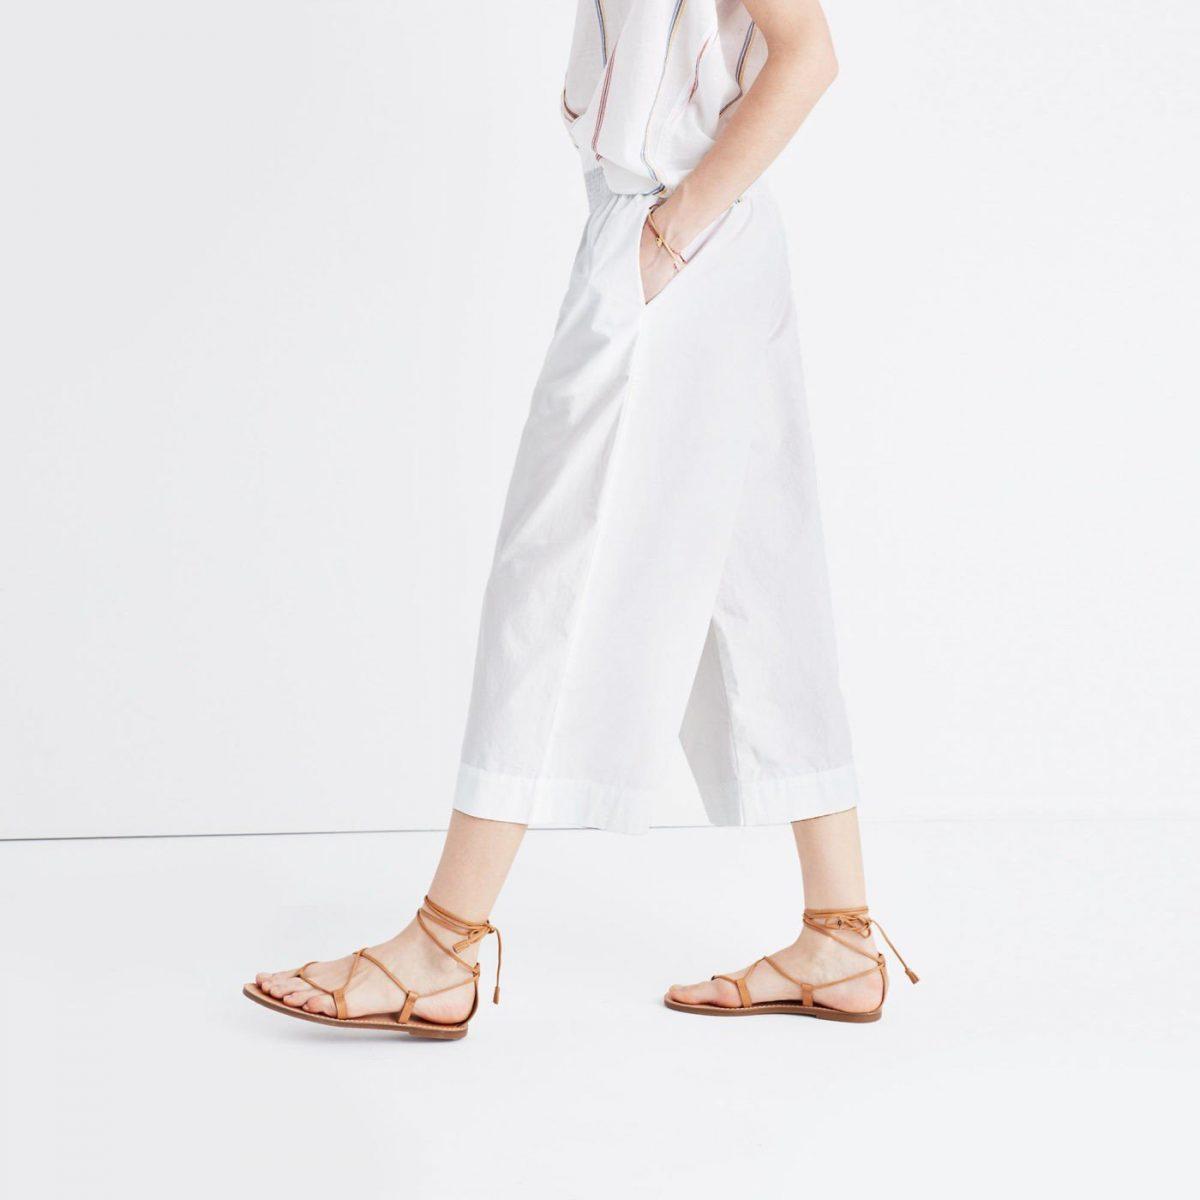 белые брюки-кюлоты и сандалии